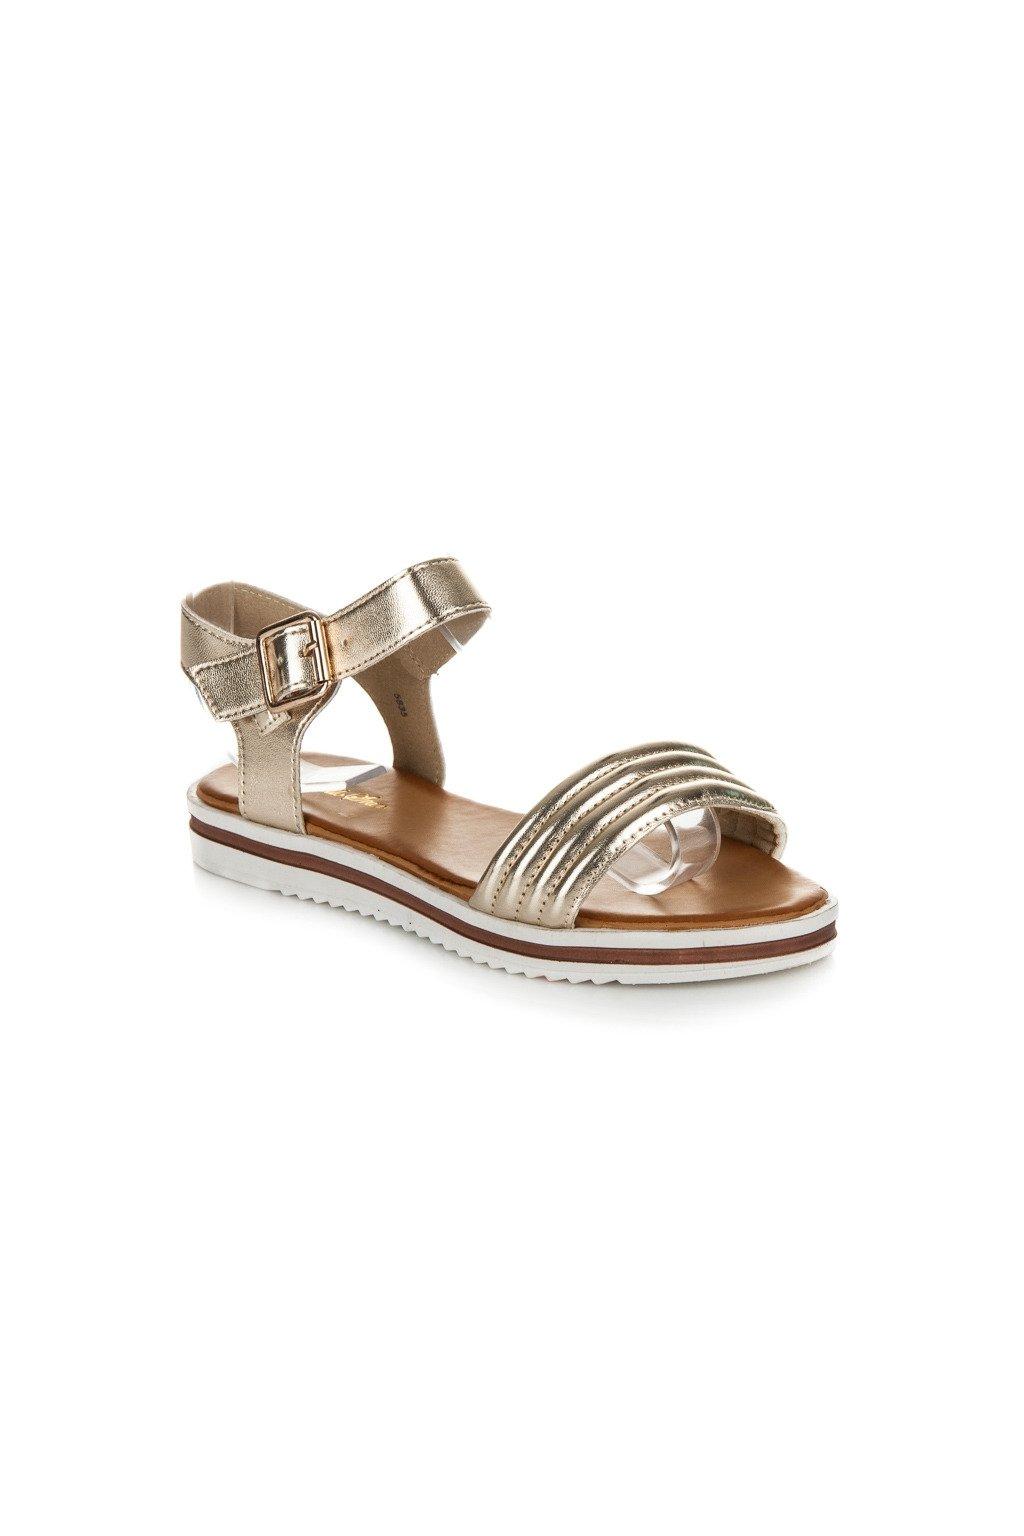 182836 luxusne zlate sandale na platforme 5835go big